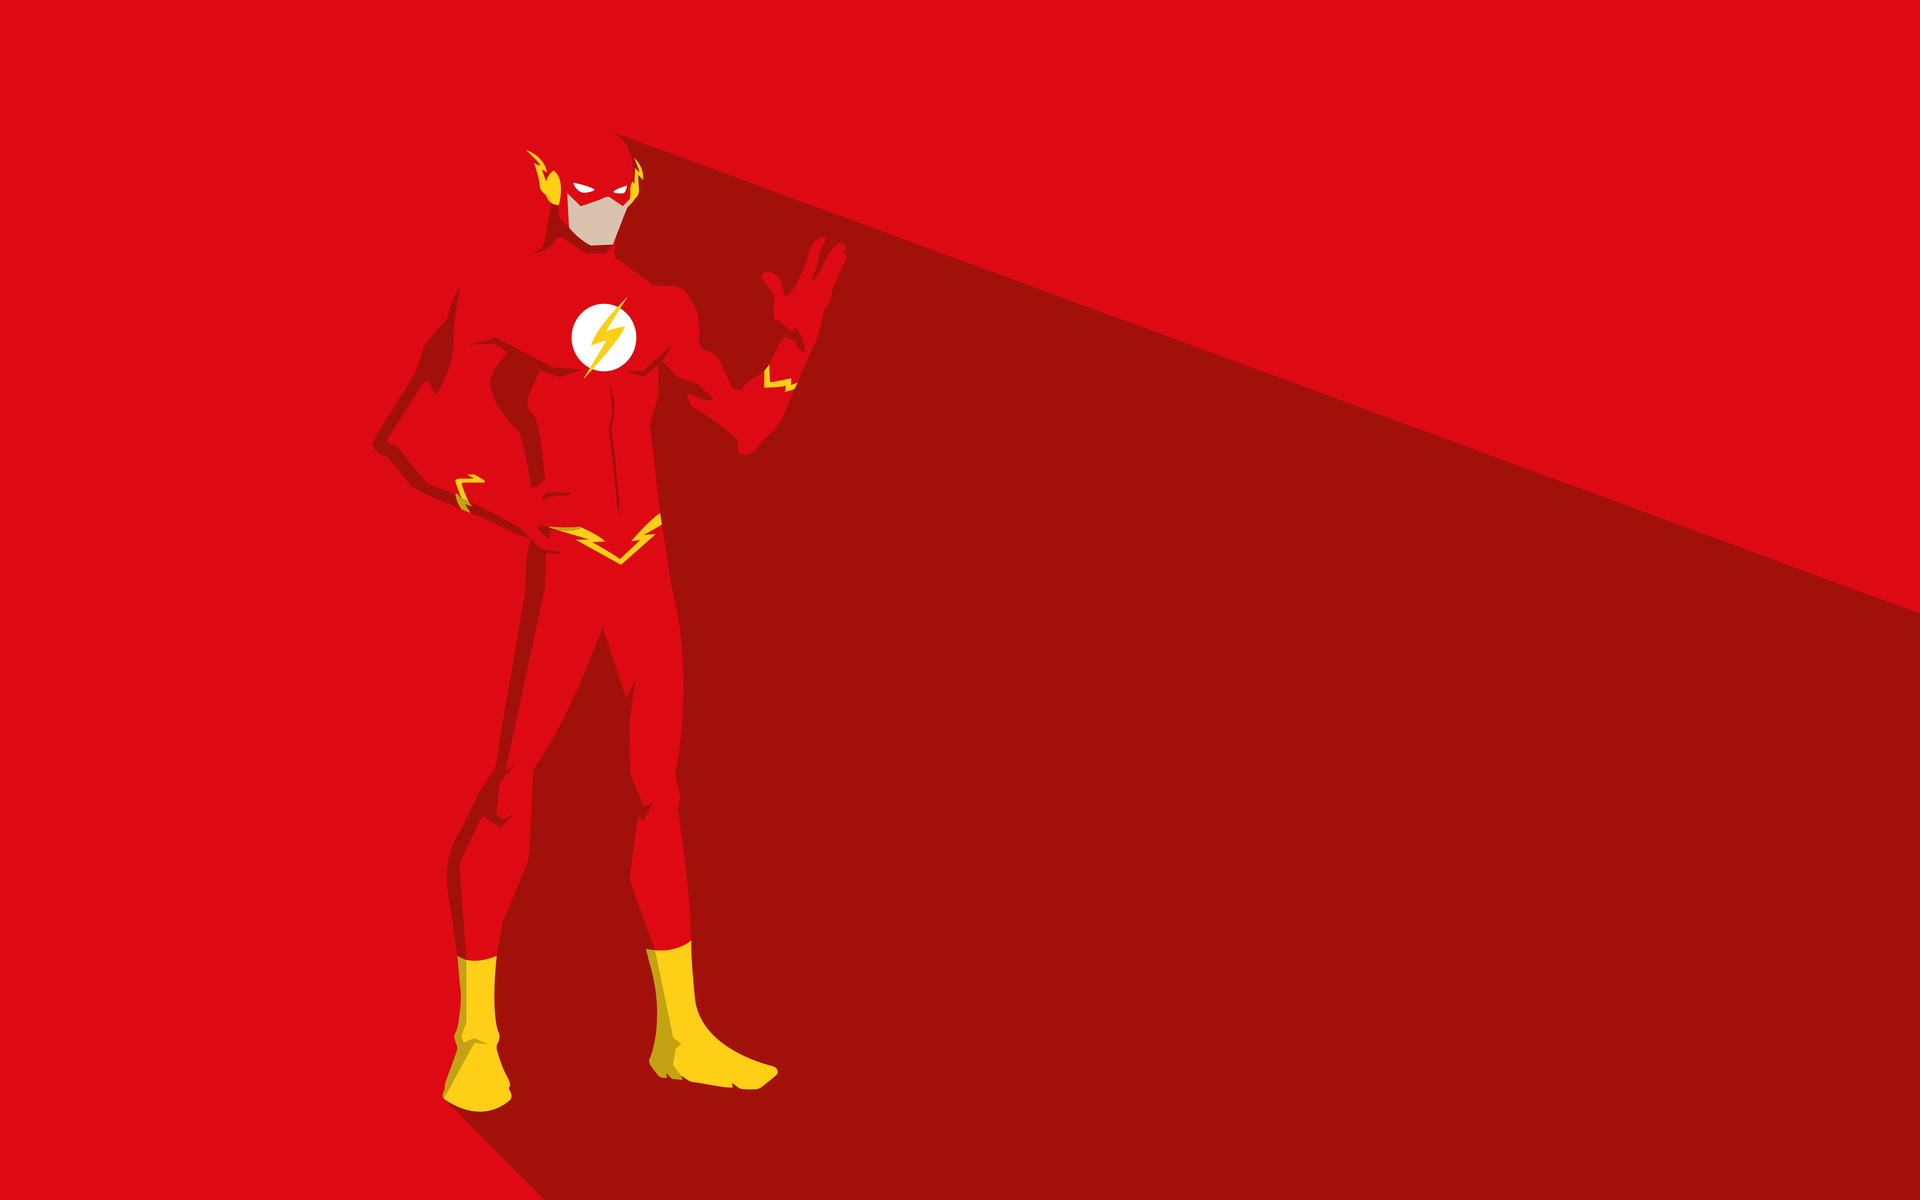 The Flash Minimal - De Super Herois Gifs , HD Wallpaper & Backgrounds